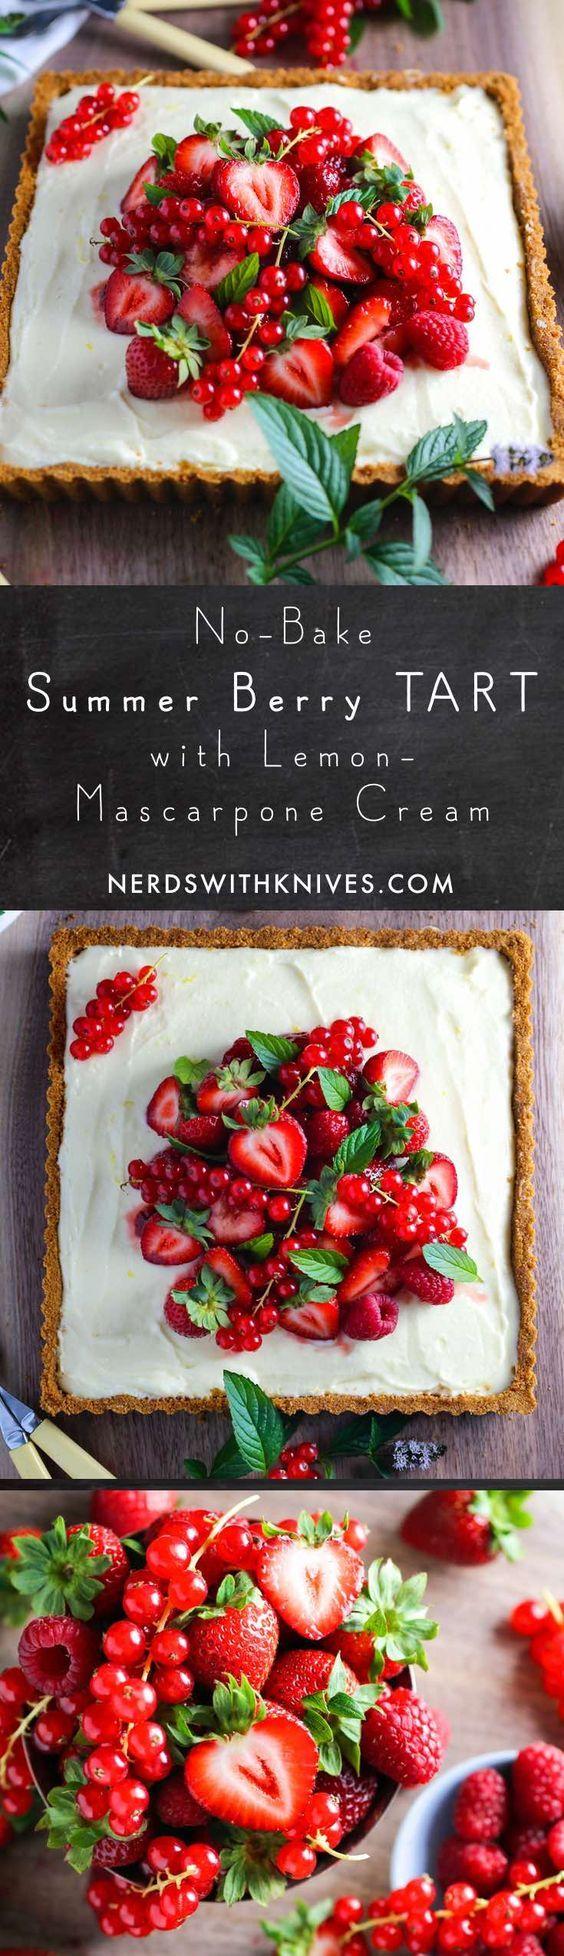 Summer Berry Tart with Lemon Mascarpone Cream - Nerds with Knives